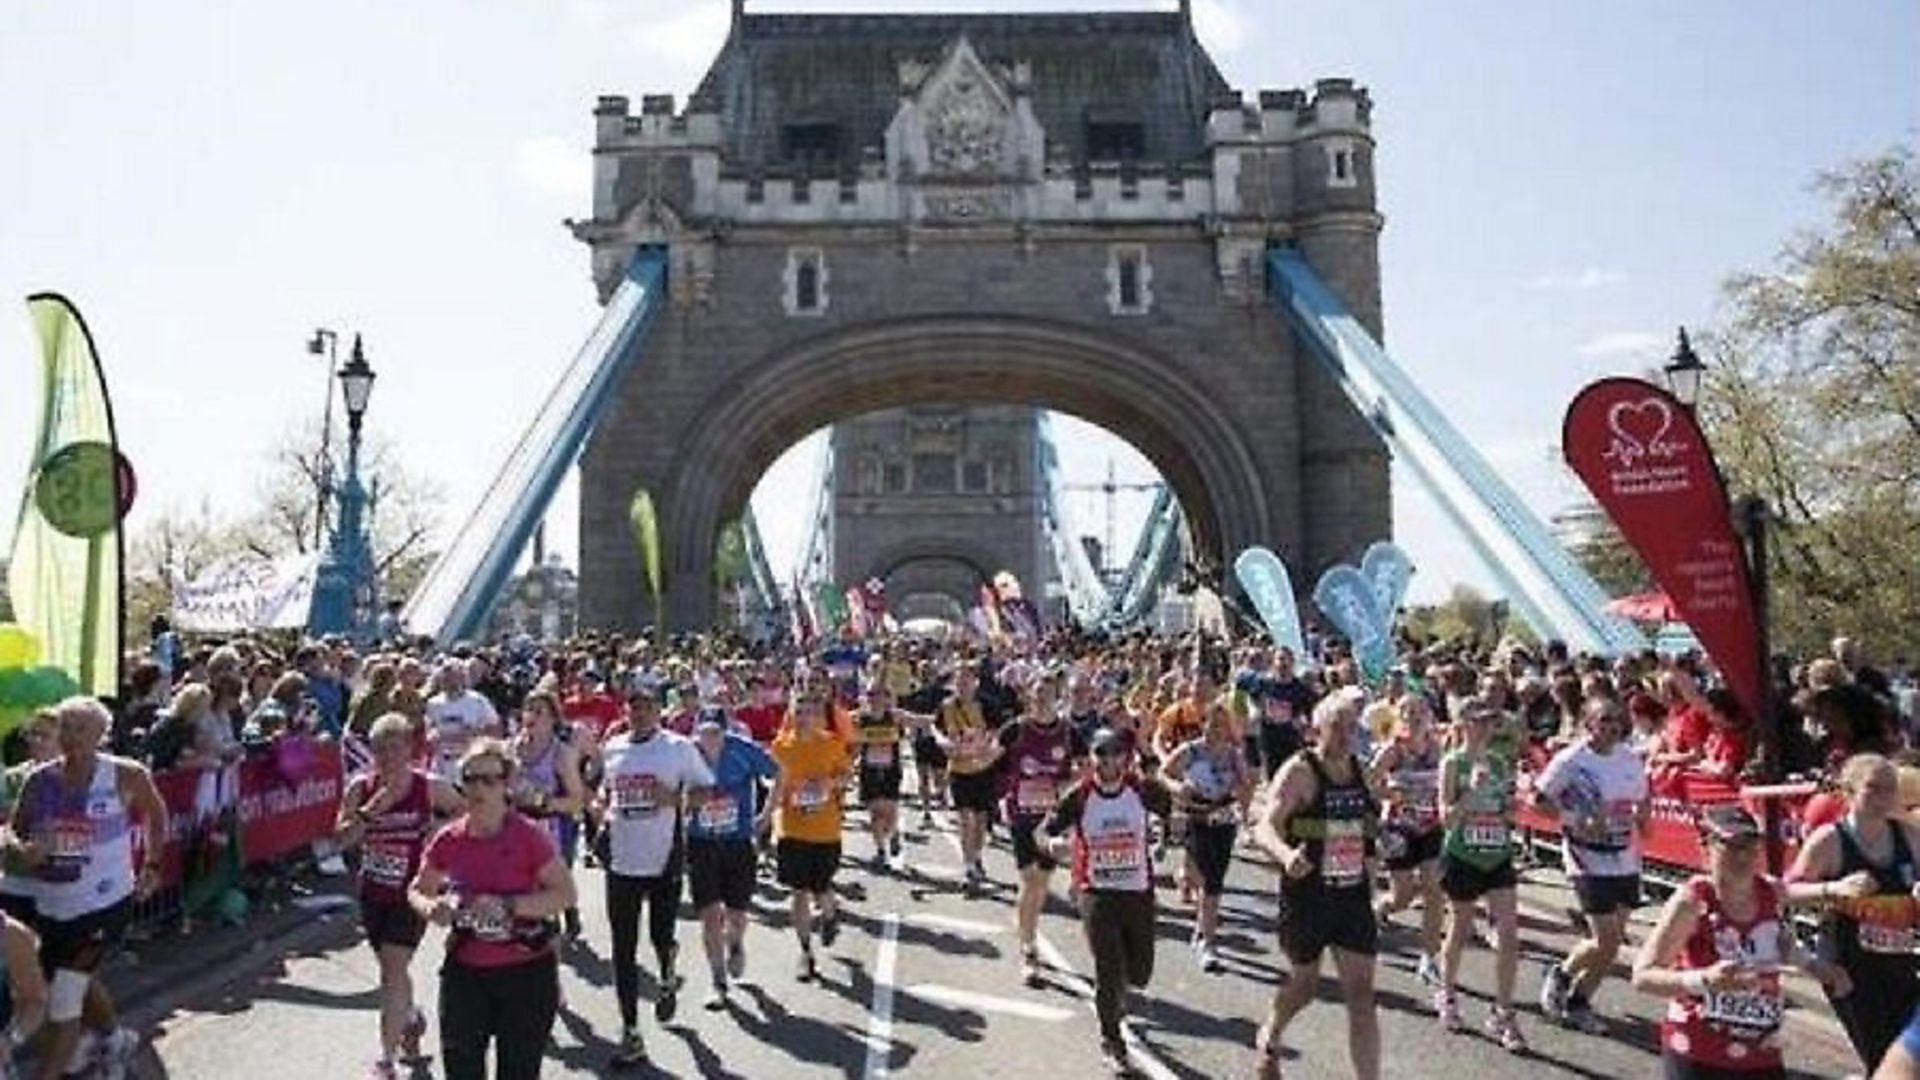 London Marathon runners set to cross Tower Bridge like those last year. Picture source: LBTH - Credit: LBTH